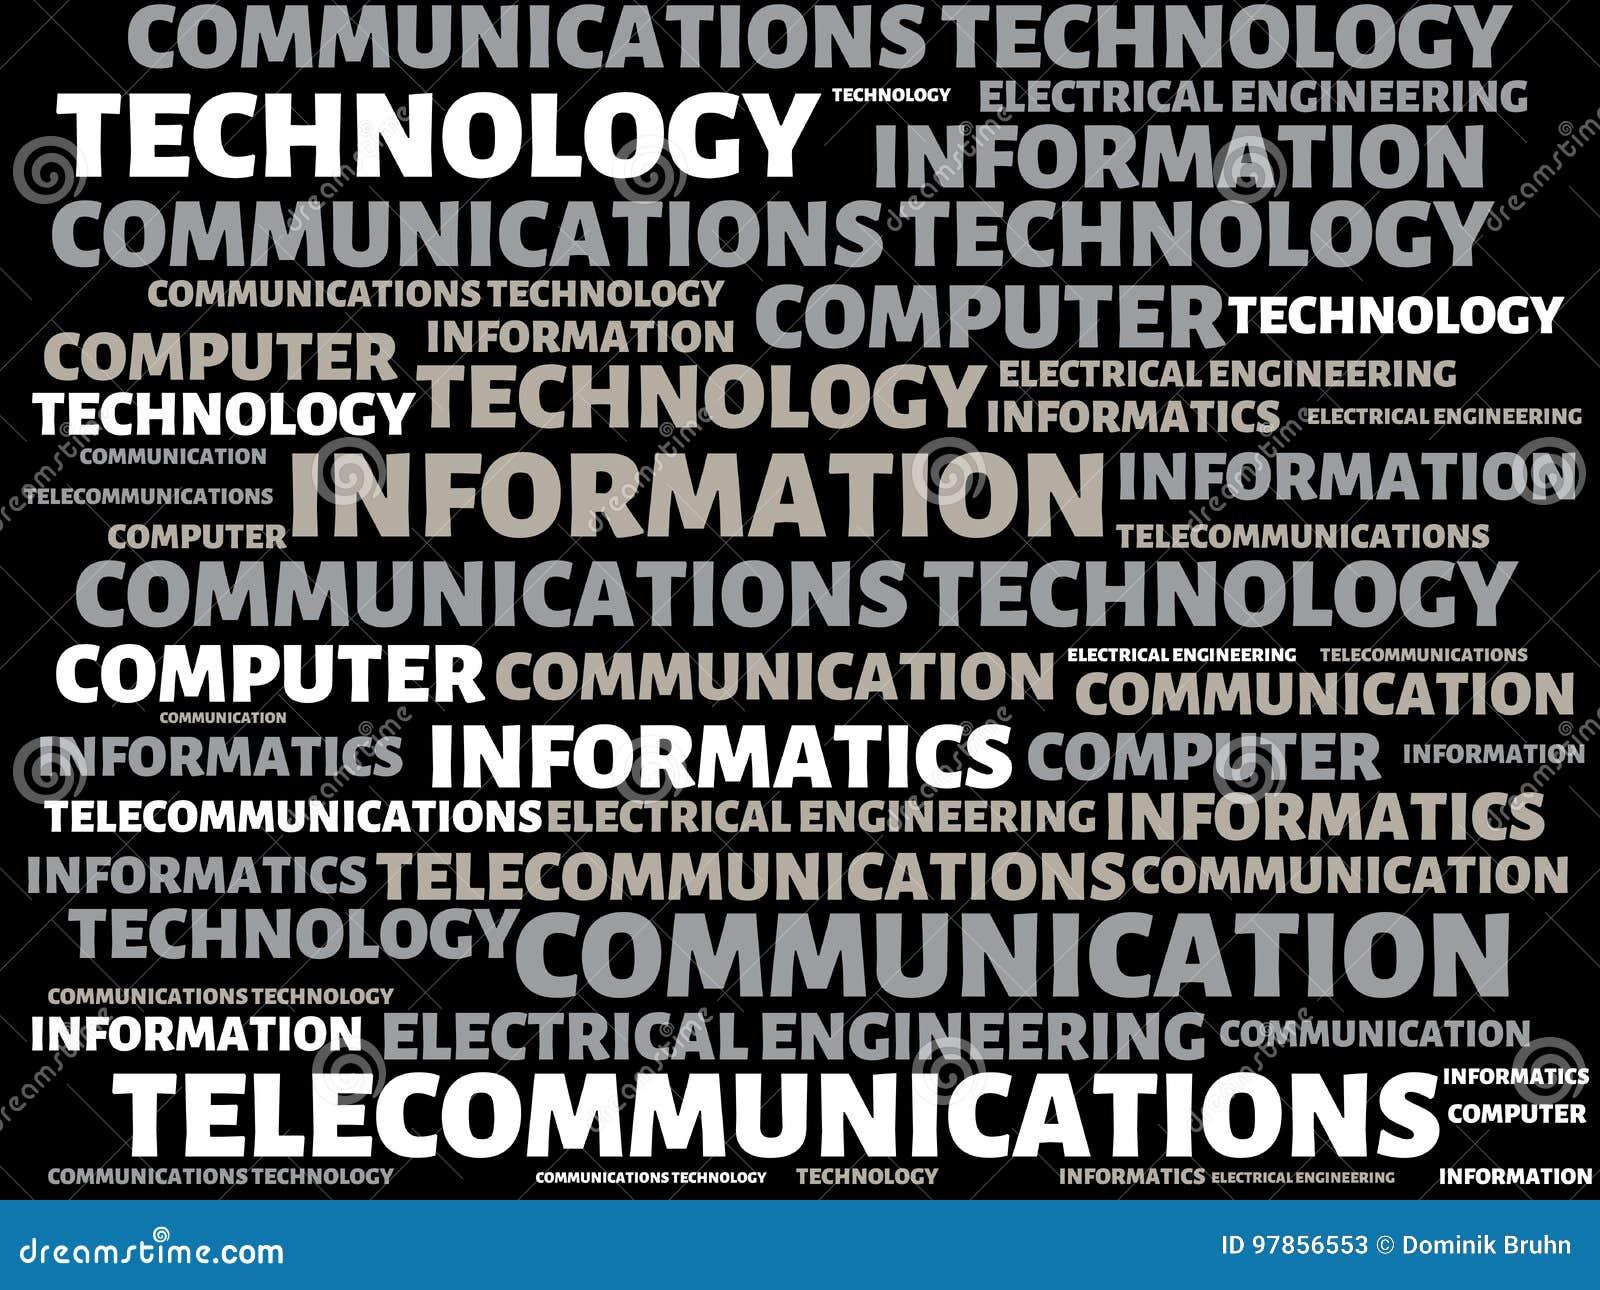 associated communications